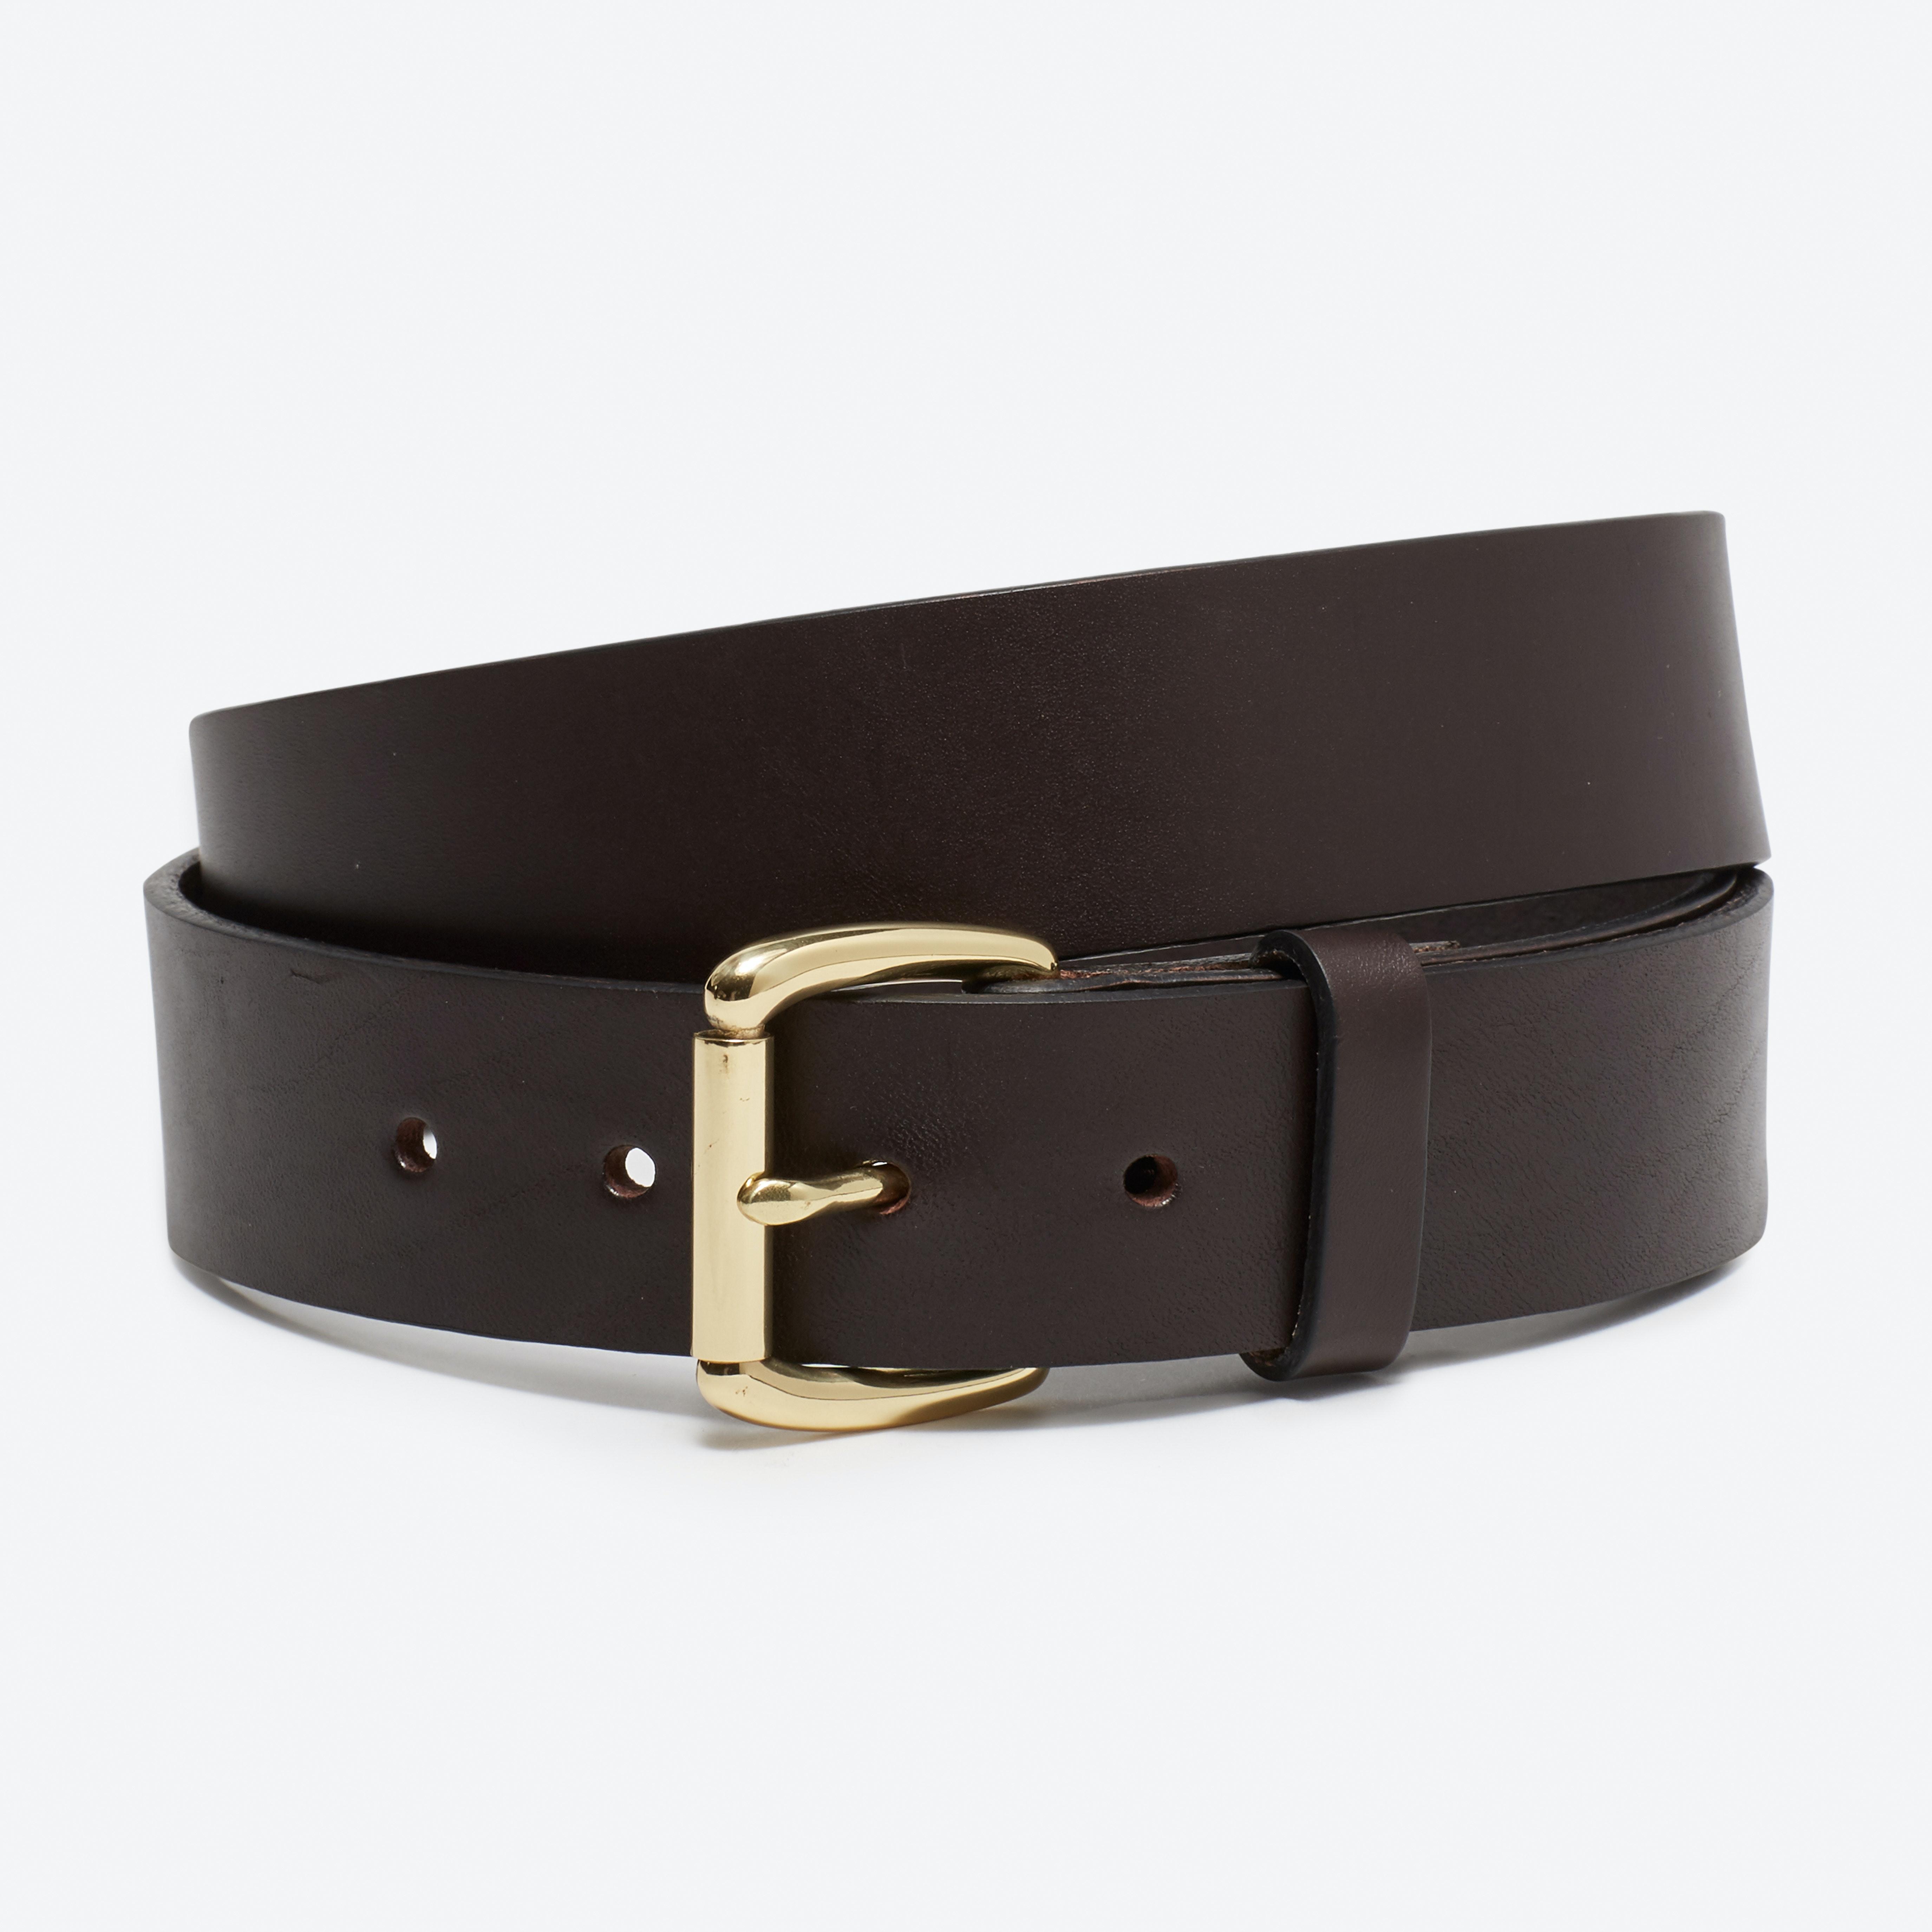 Leather Jeans Belt